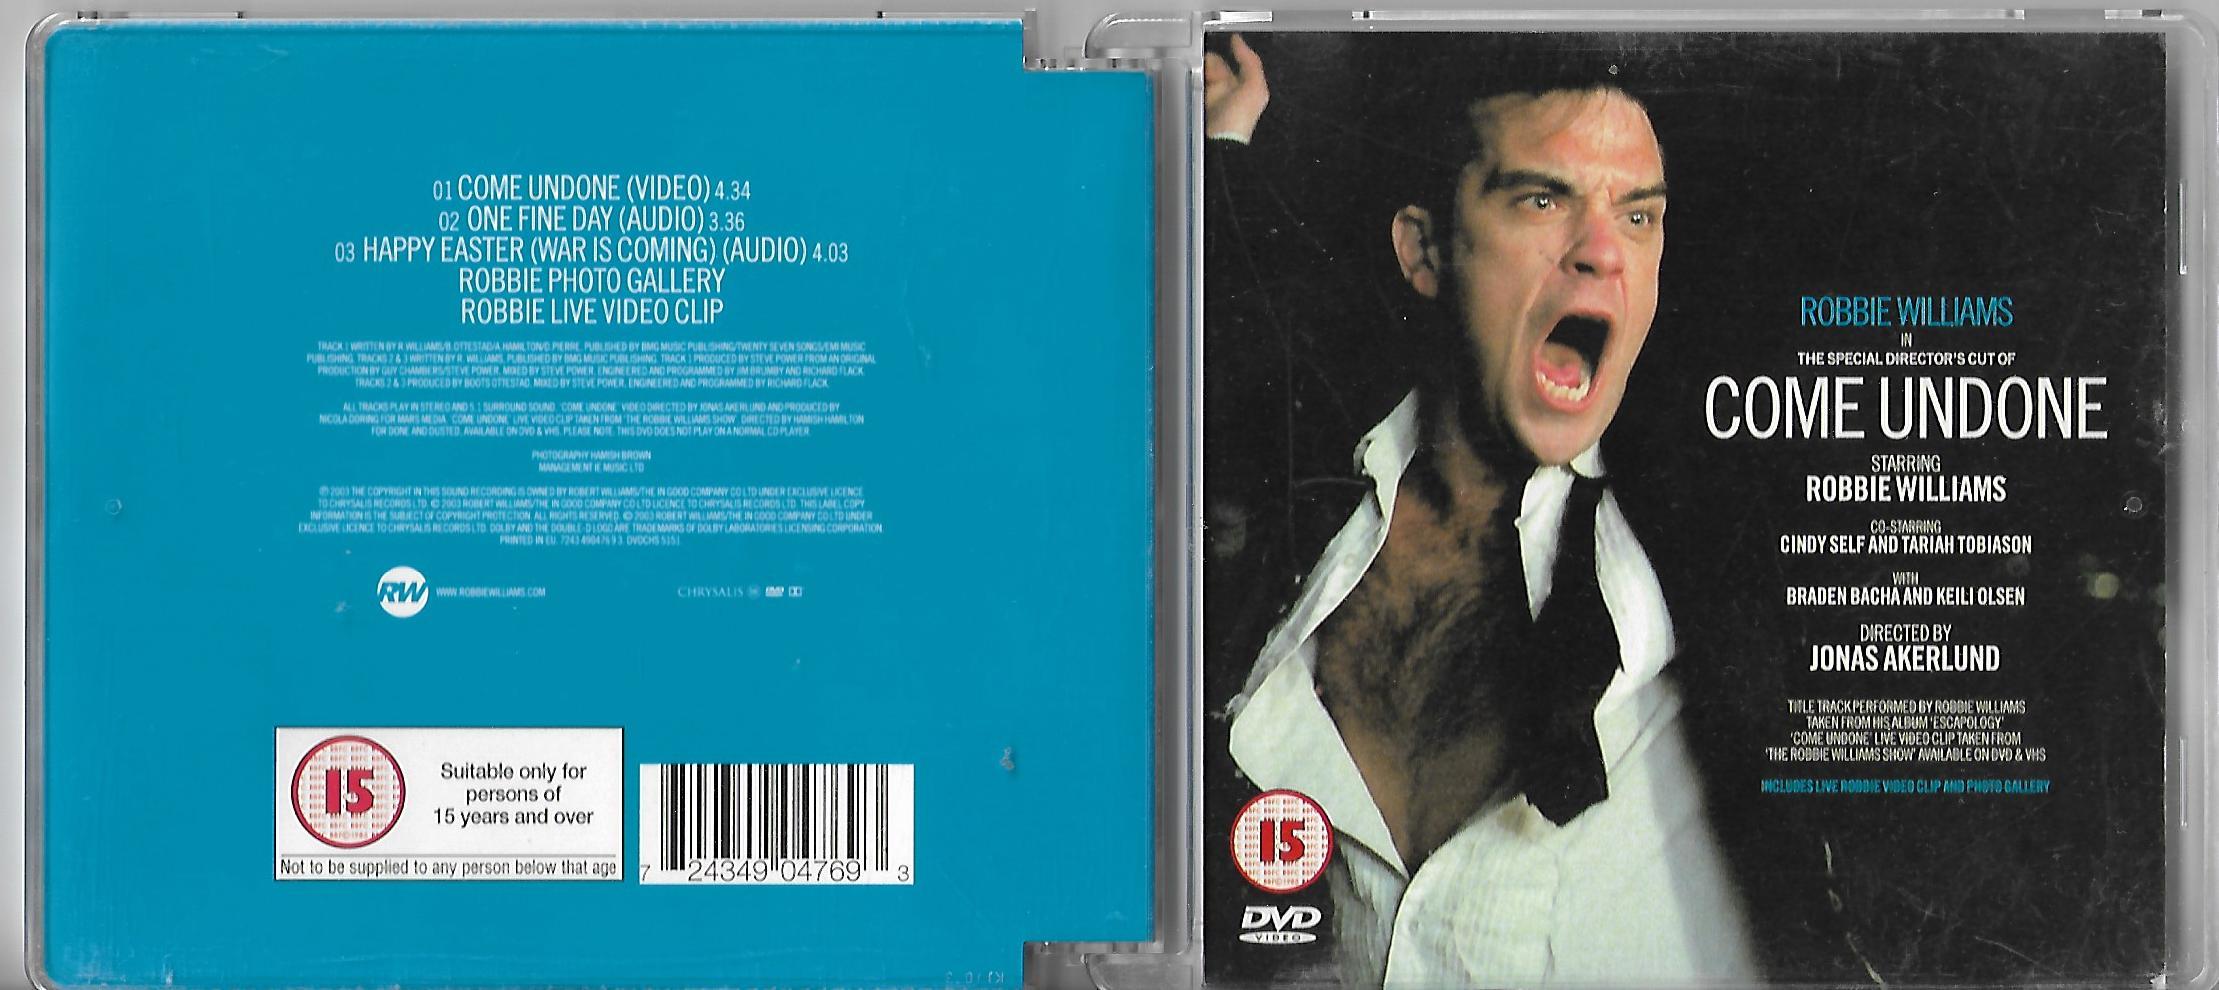 Robbie WILLIAMS - Come Undone 3 Tracks Gallery And Video Clip